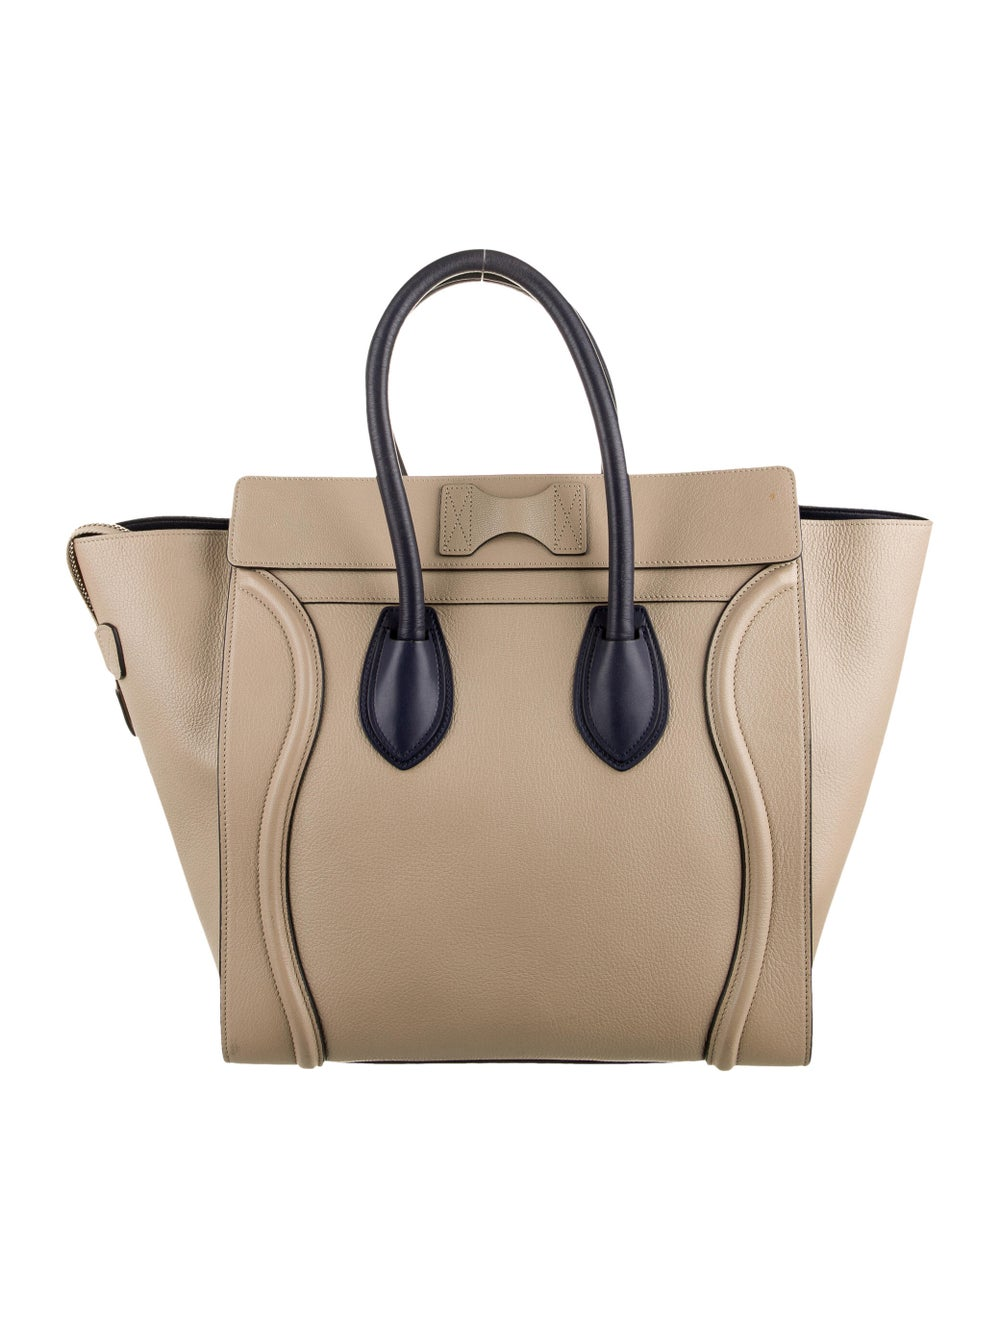 Celine Mini Luggage Tote Tan - image 4